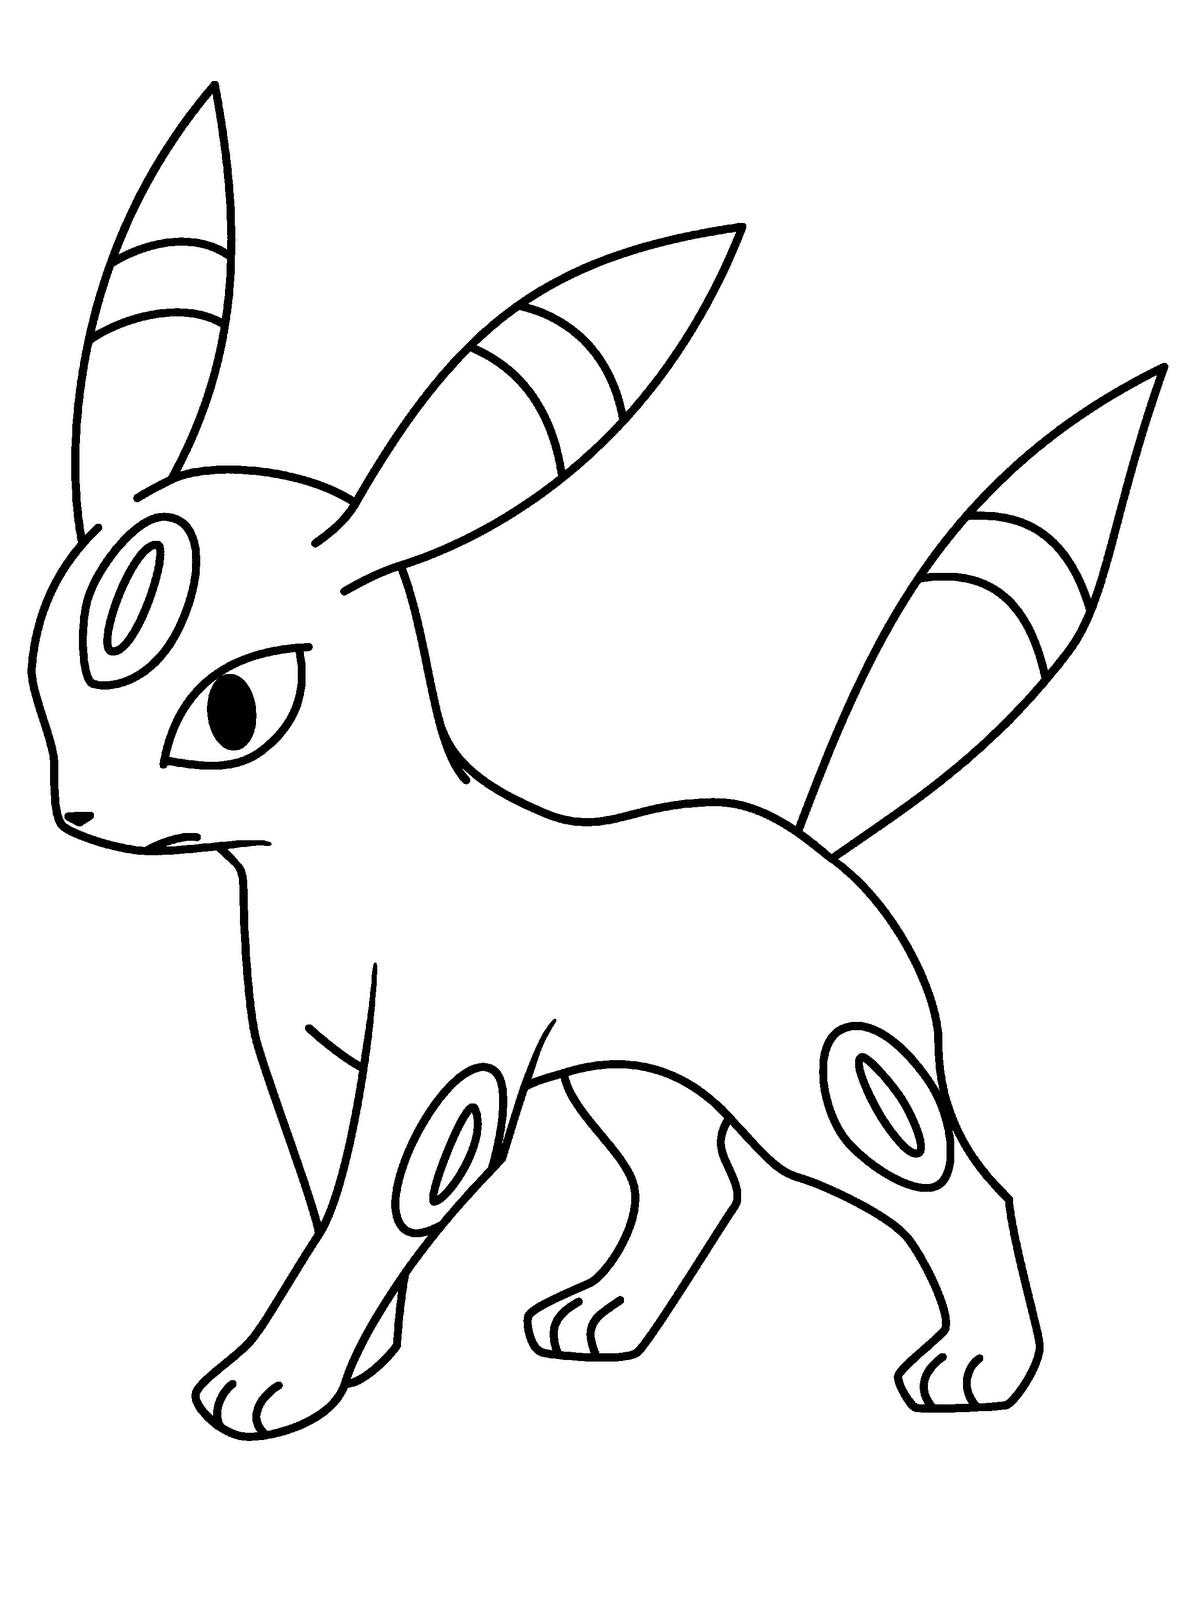 Imprimir Desenhos Do Pokemon